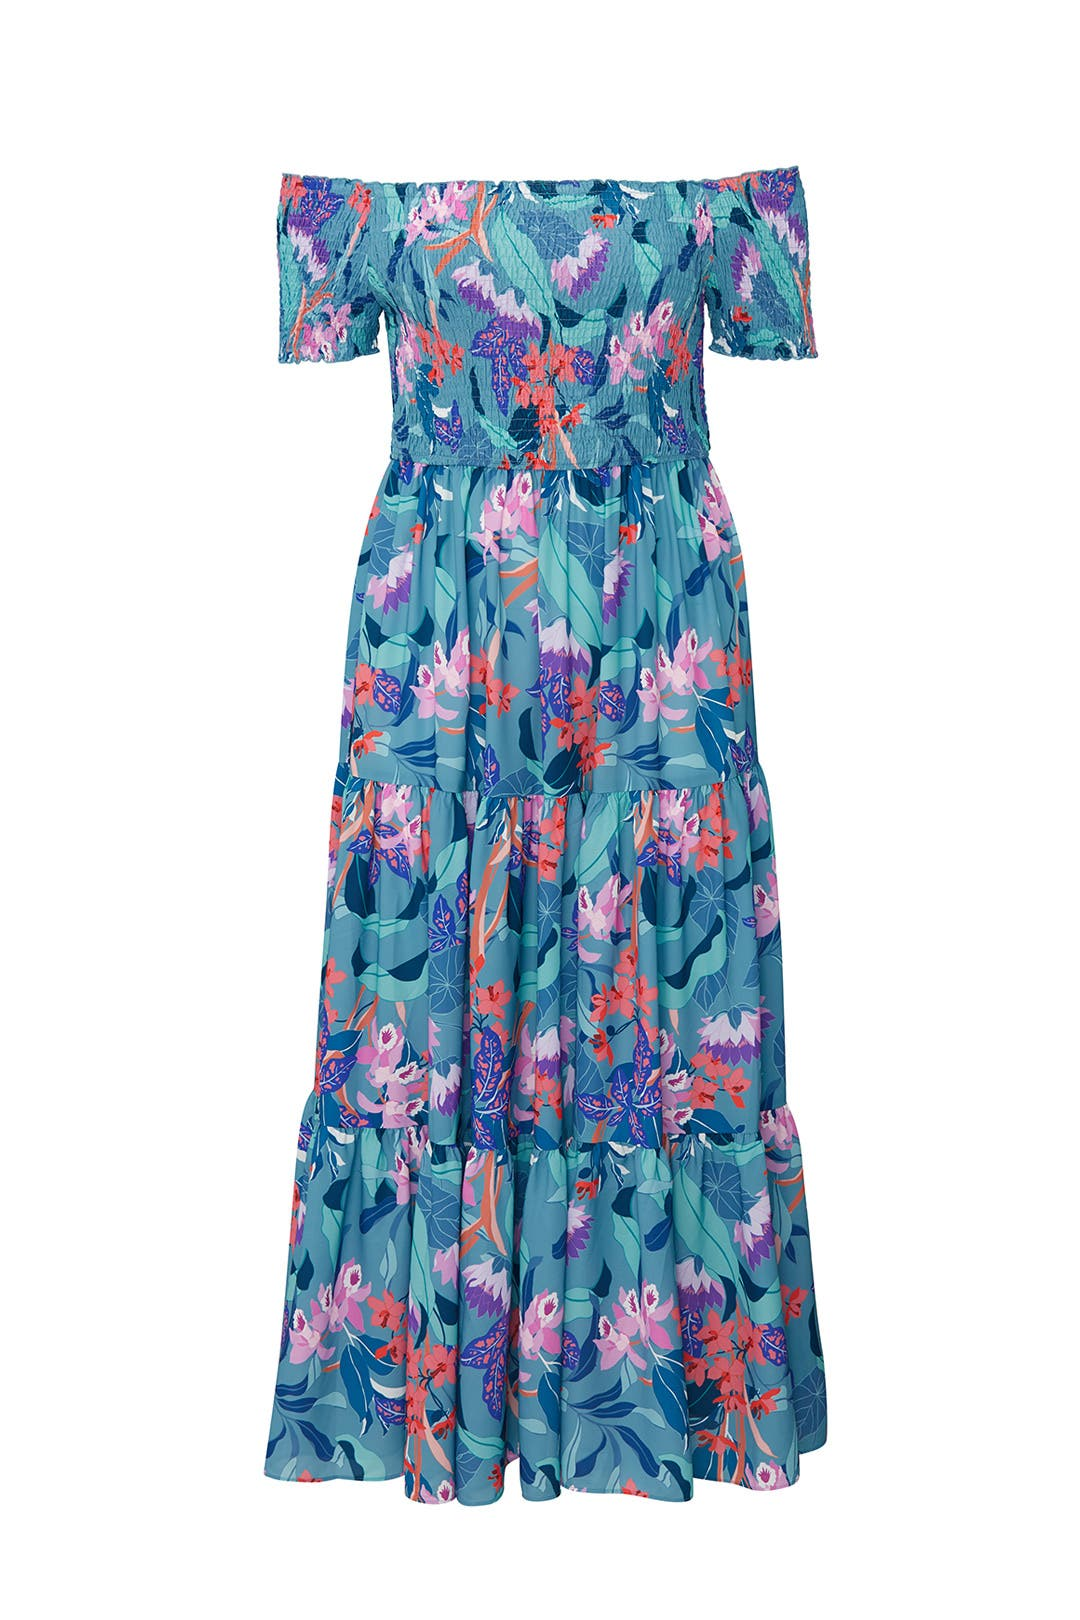 56c80346d Rent The Runway Floral Maxi Dress - Aztec Stone and Reclamations